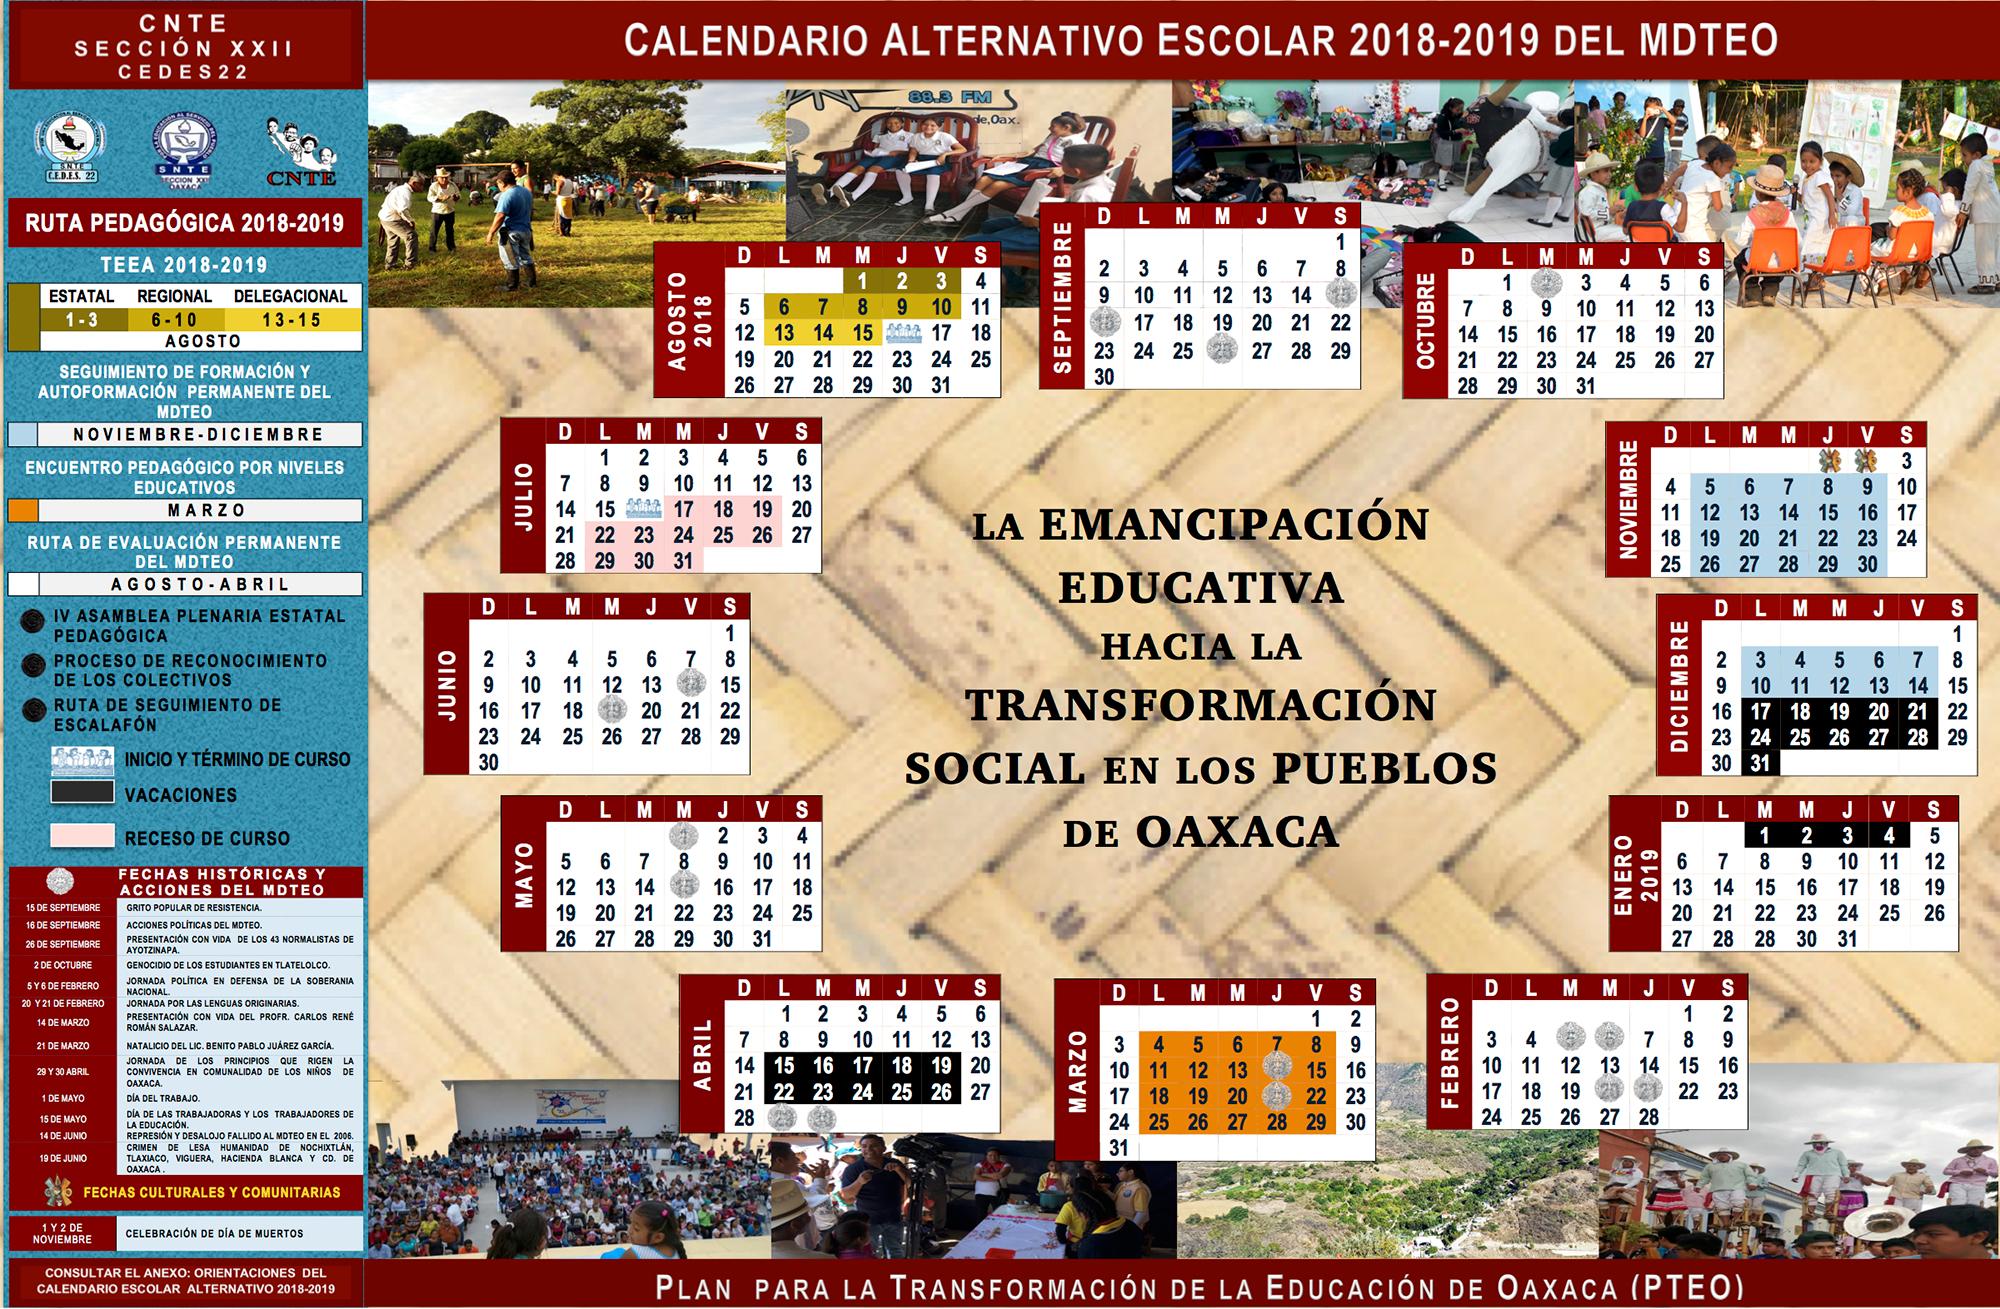 Calendario 2919 Para Imprimir.Calendario Alternativo Escolar 2018 2019 Del Mdteo Centro